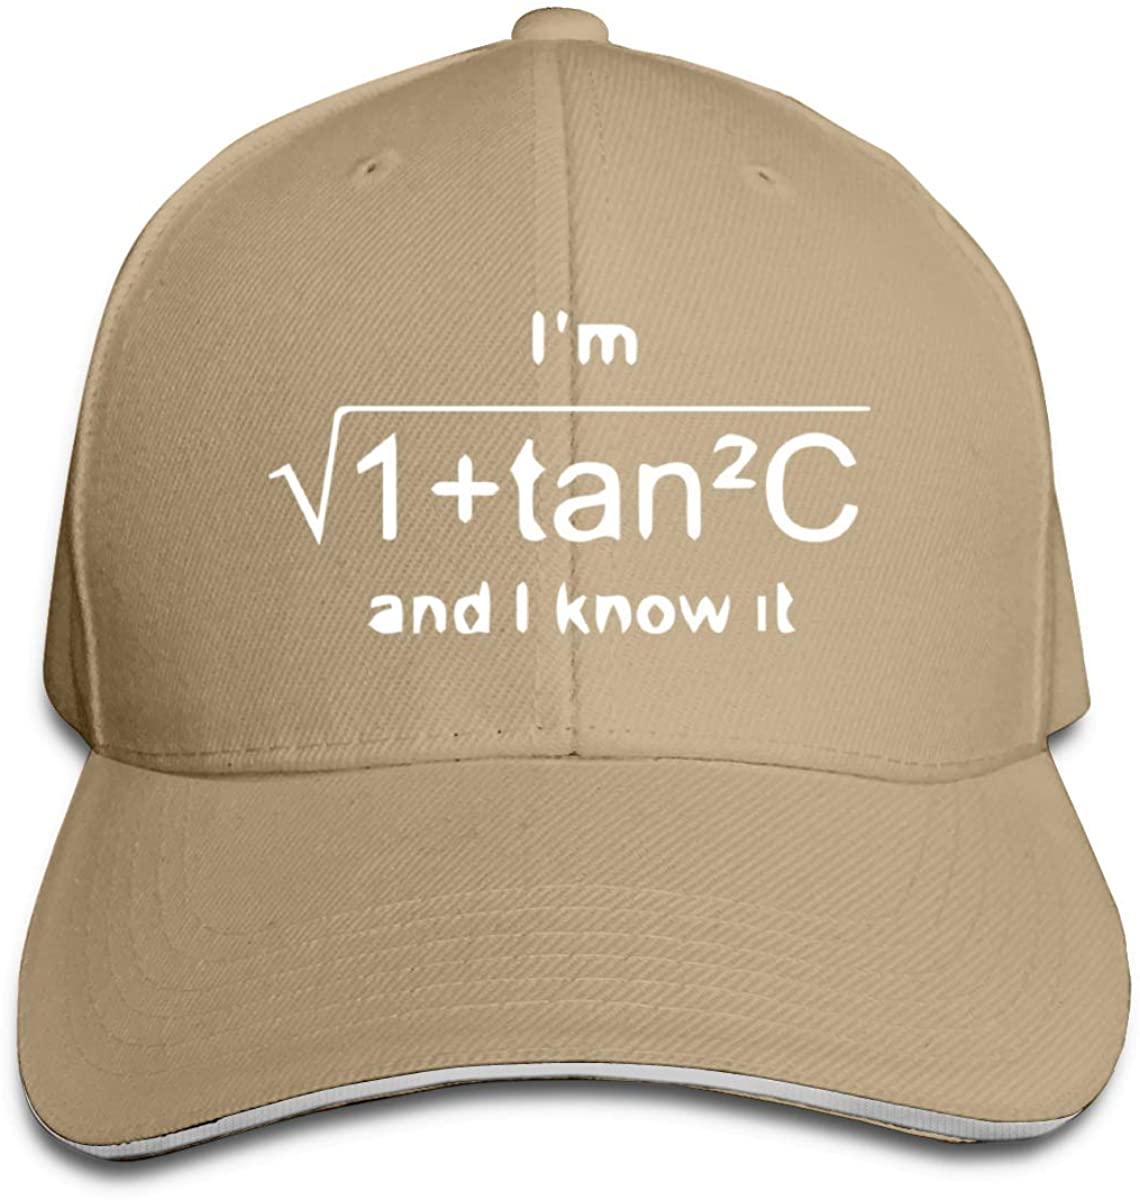 Donmlier Sandwich Hat Classic Funny Math Geometry Quiz Logo Mens&Women Dad Cap Adjustable Unisex